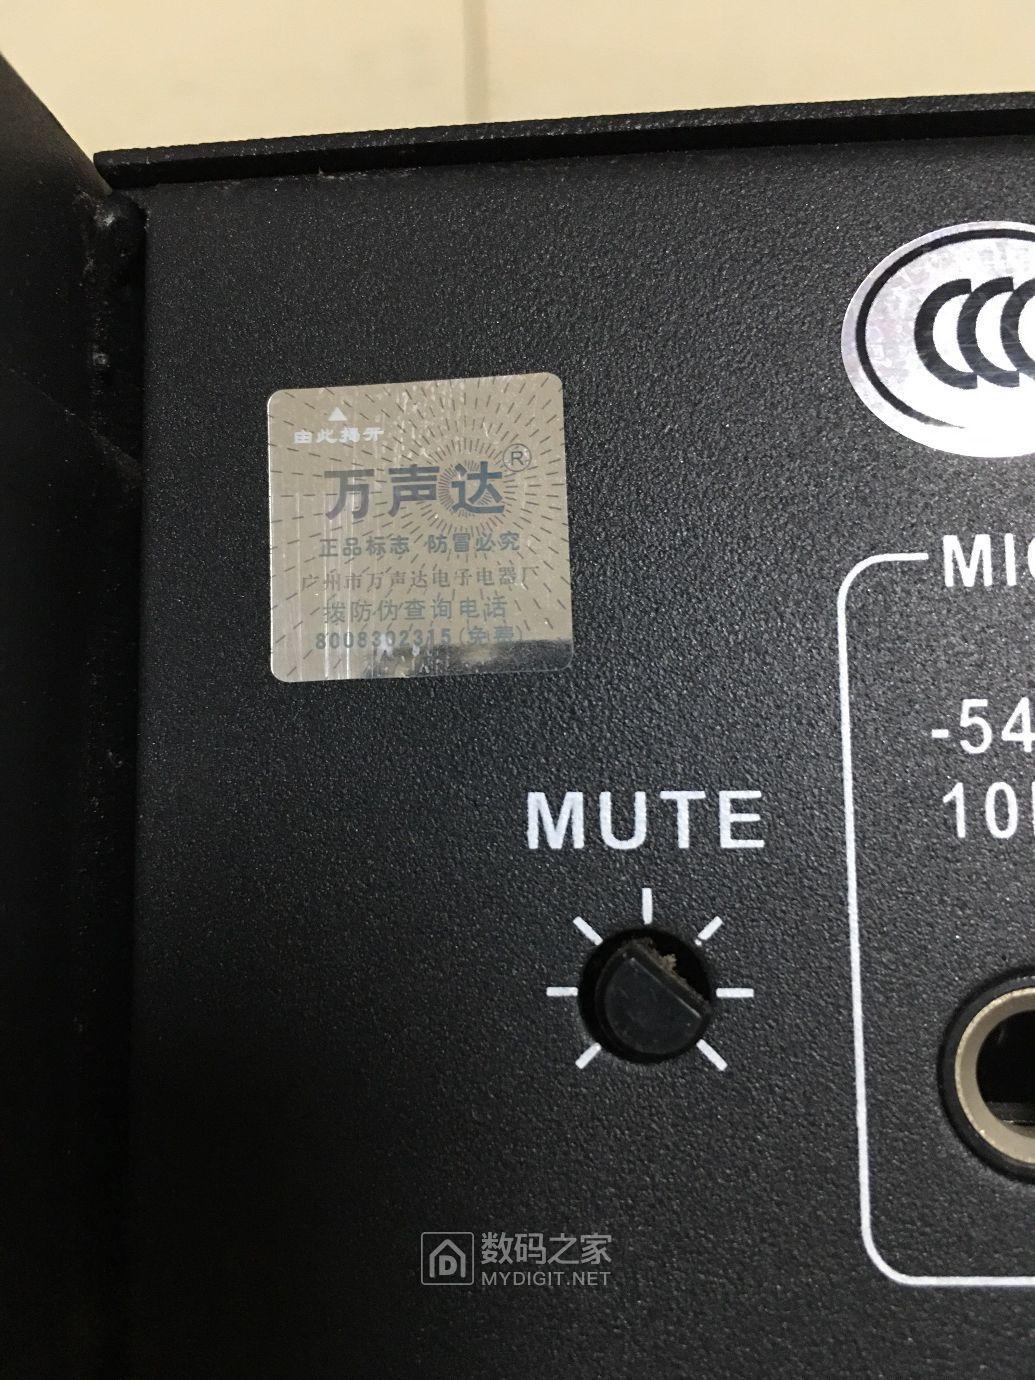 E1925605-3EC0-47EB-B3AE-F489D0A87638.jpeg